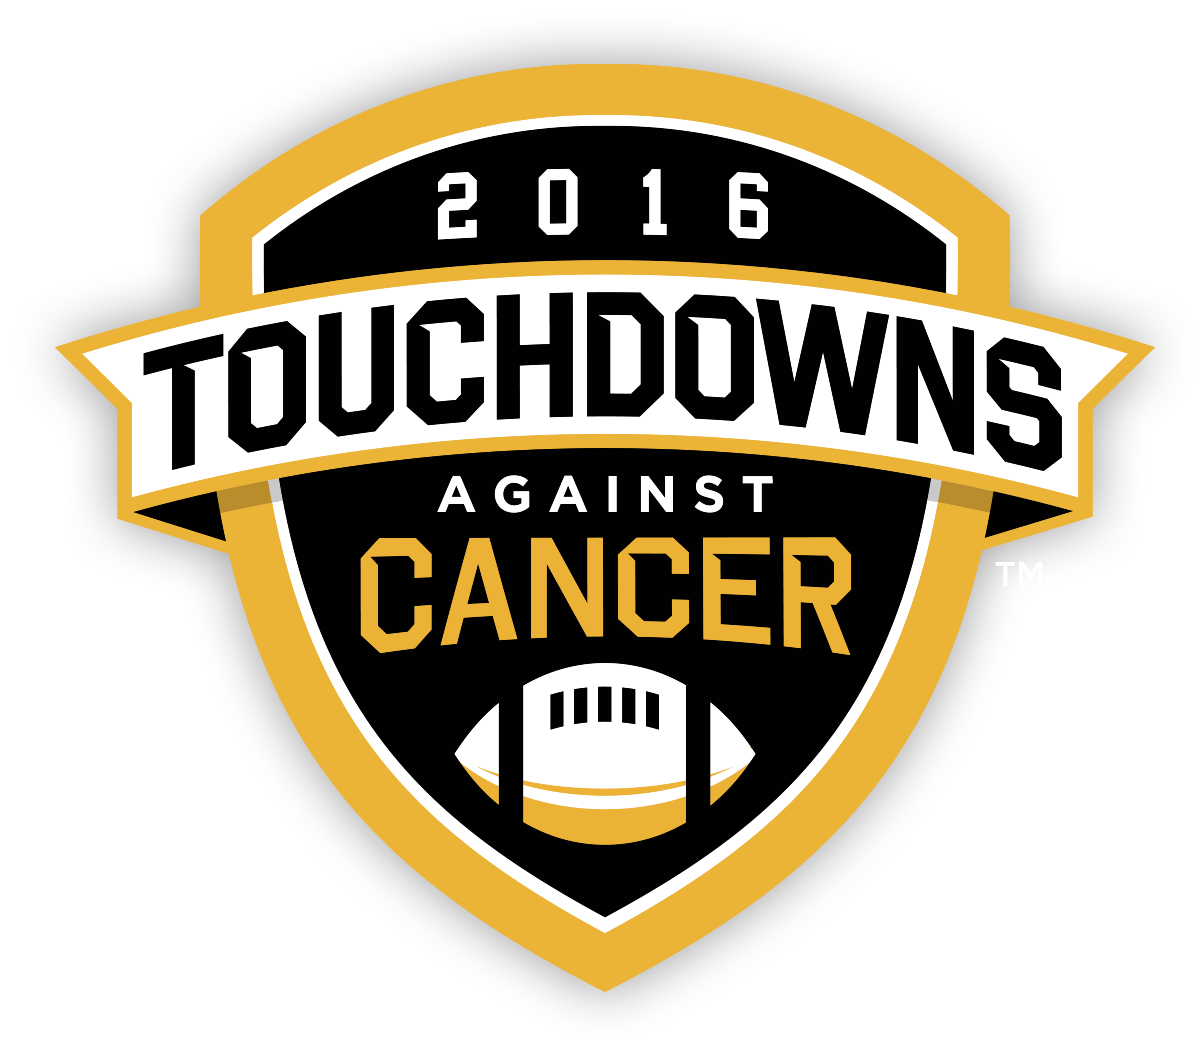 Touchdowns Against Cancer 2016